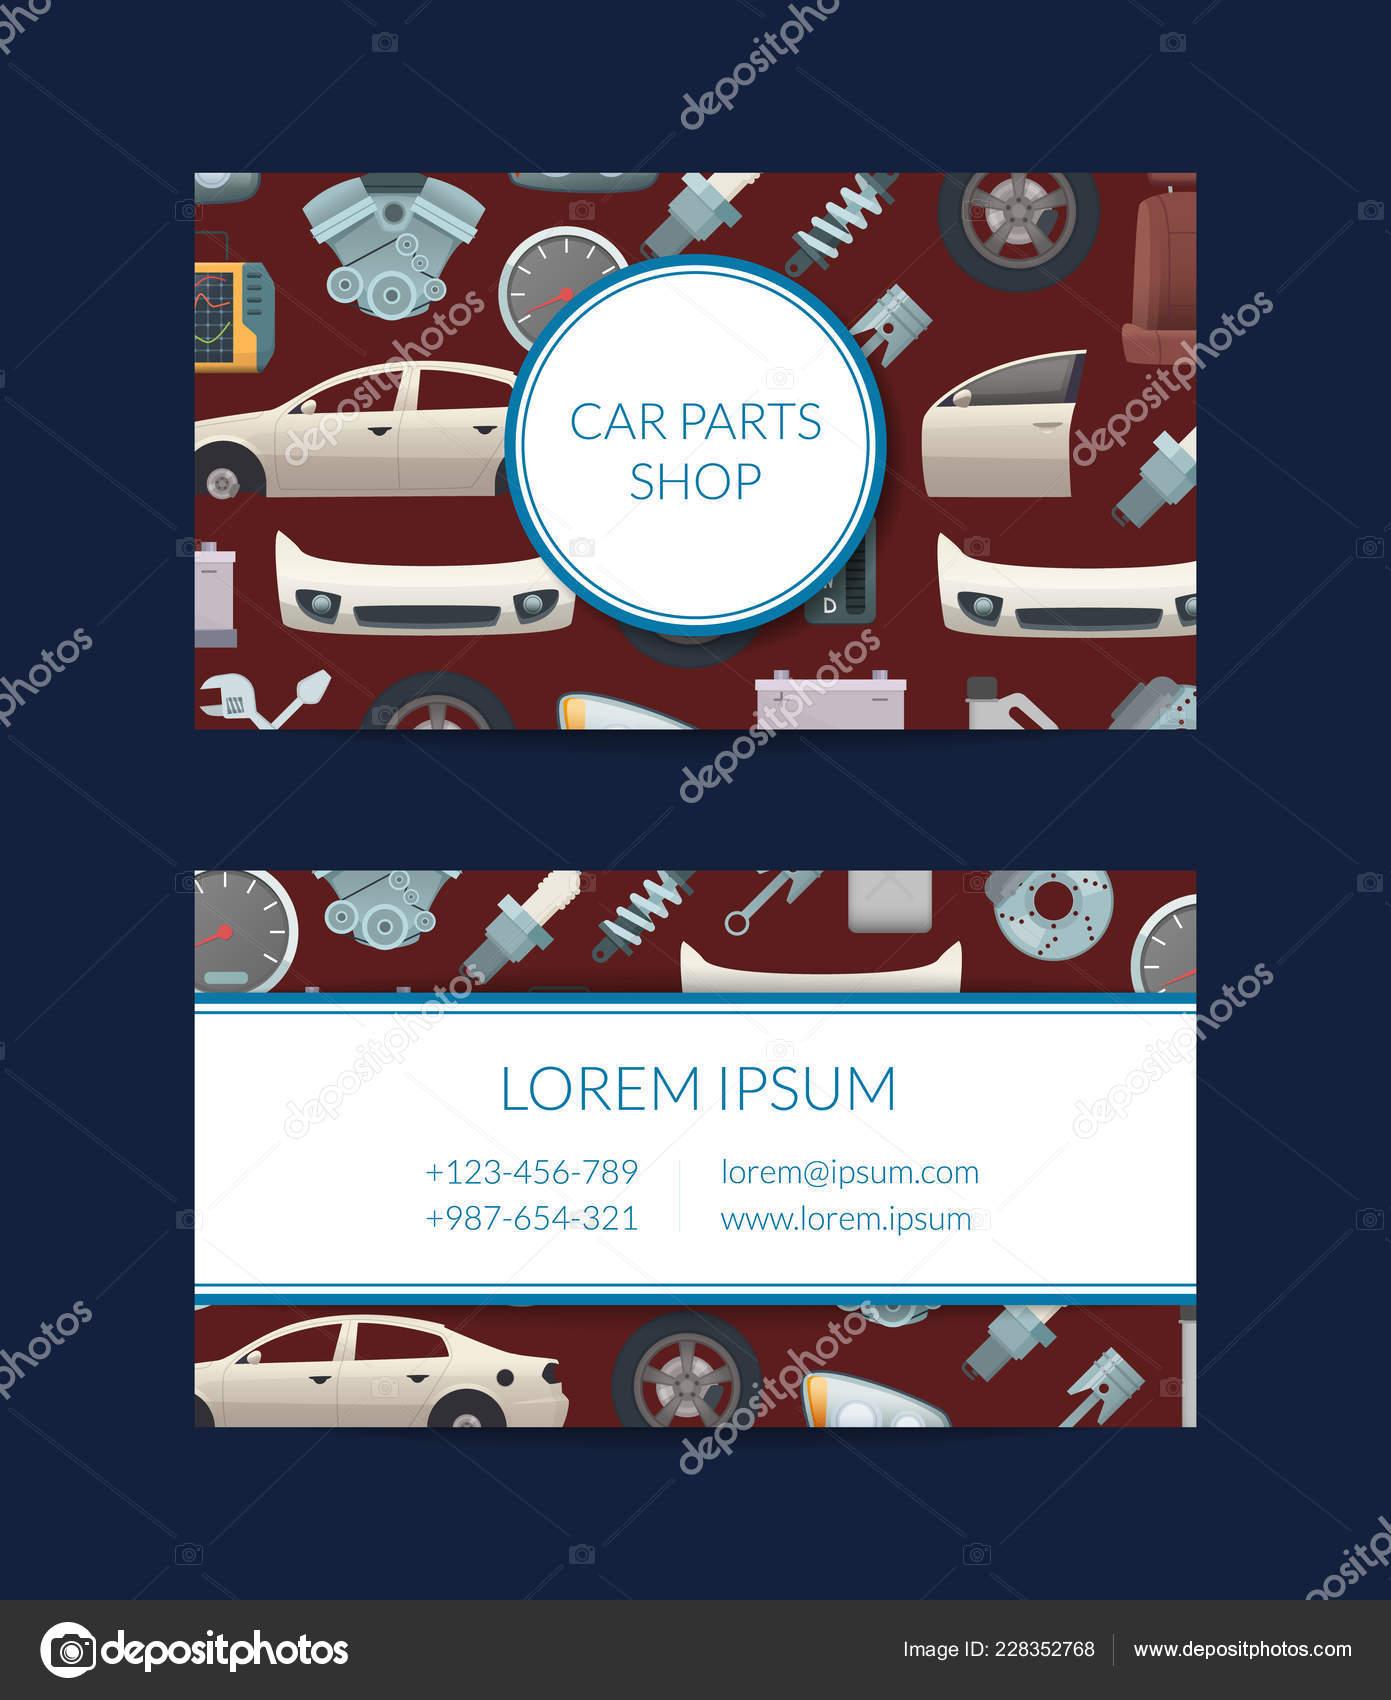 Auto Teile Visitenkarte Vorlage Vektorgrafik Stockvektor